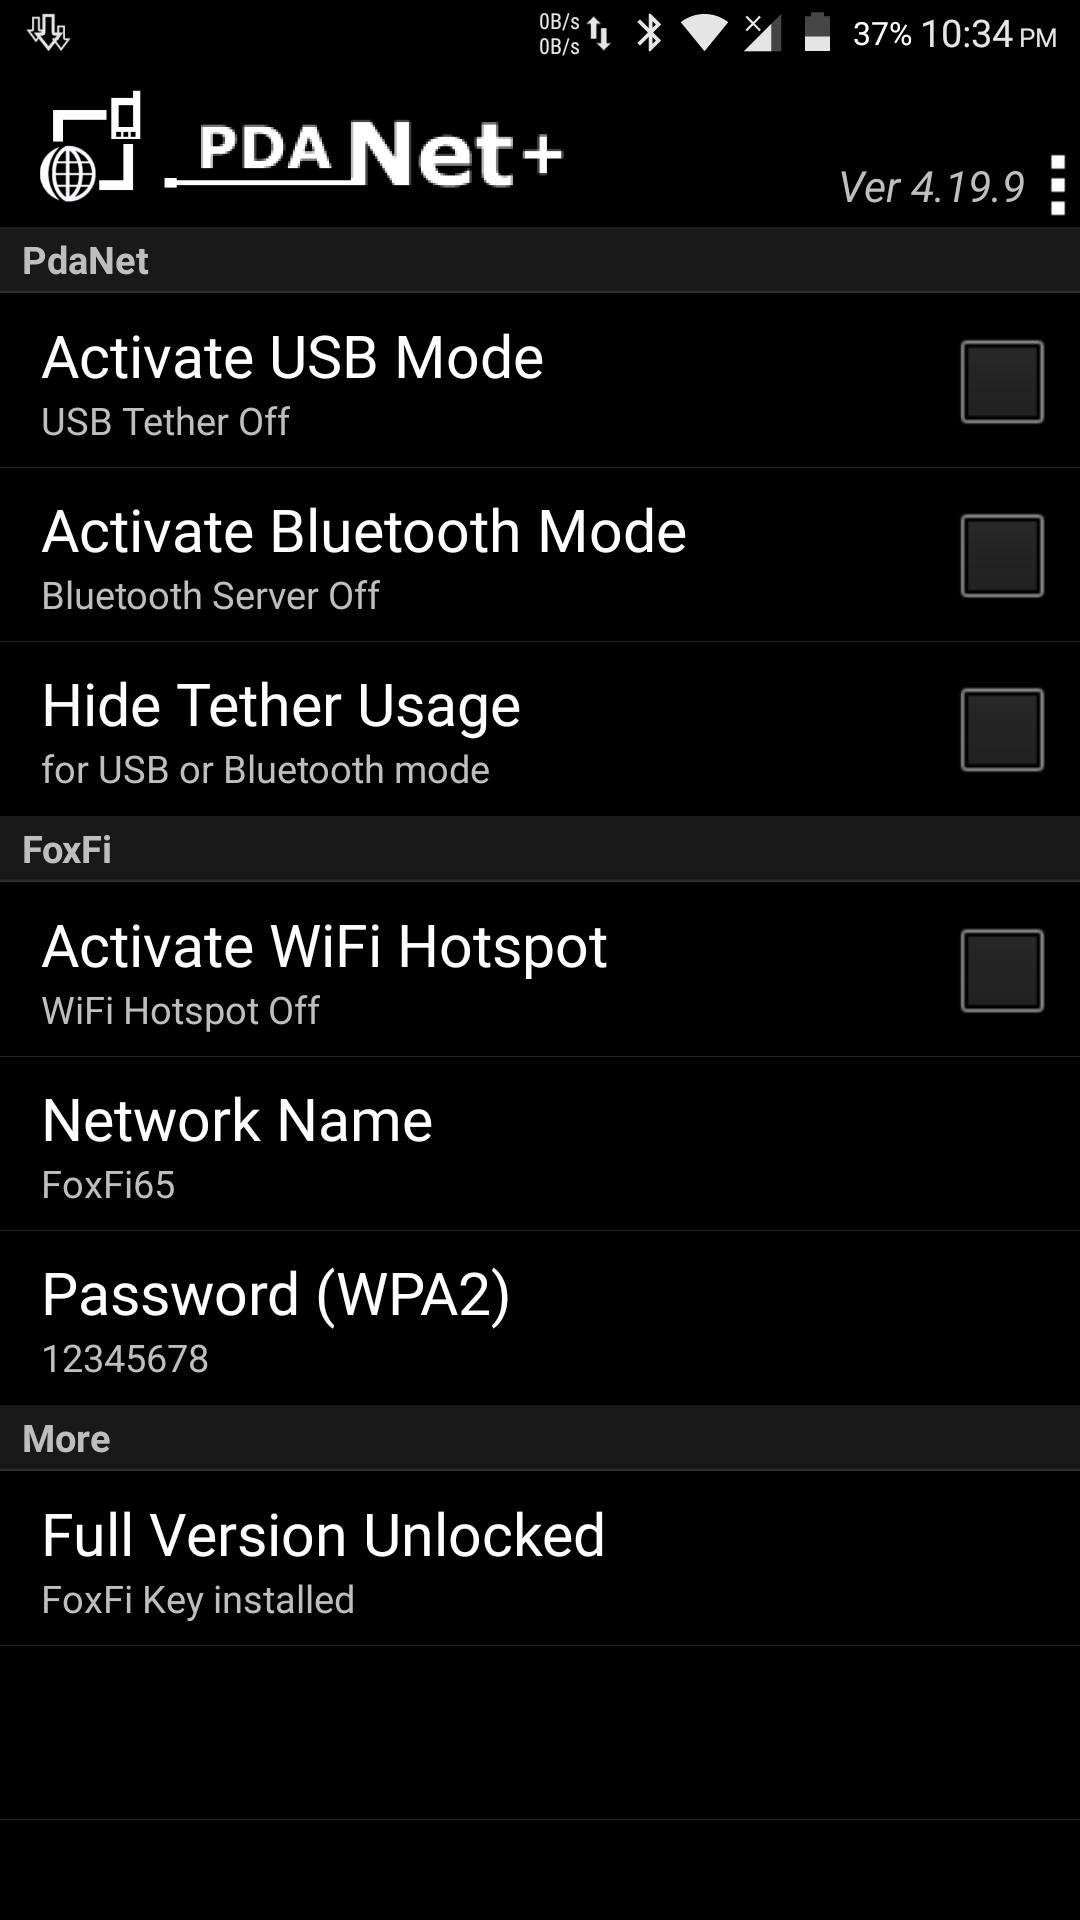 connectify hotspot 2017 activation key